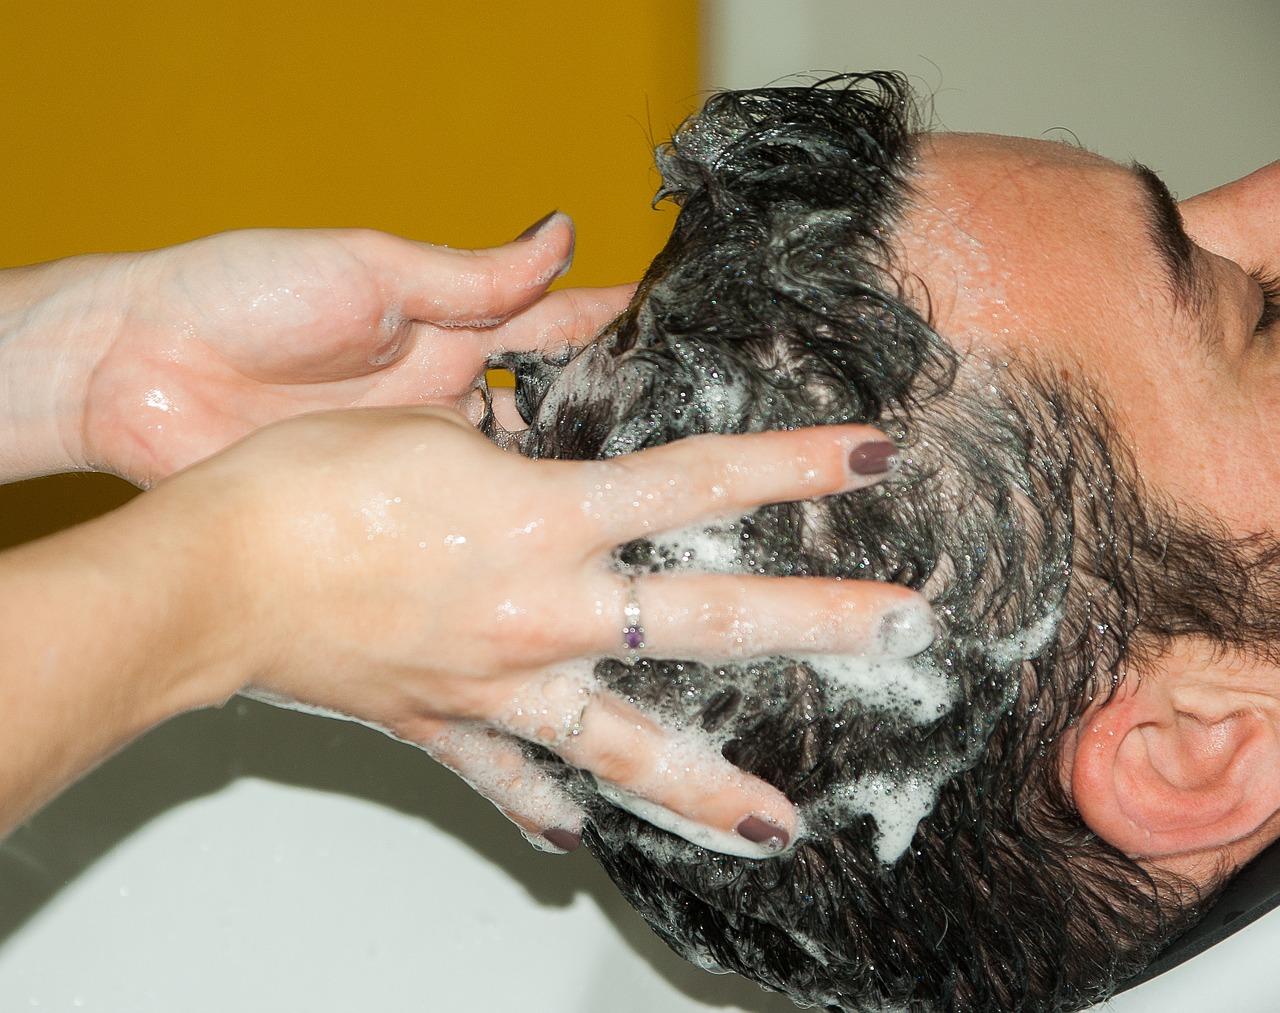 fejbőr psoriasis kezelése ecettel